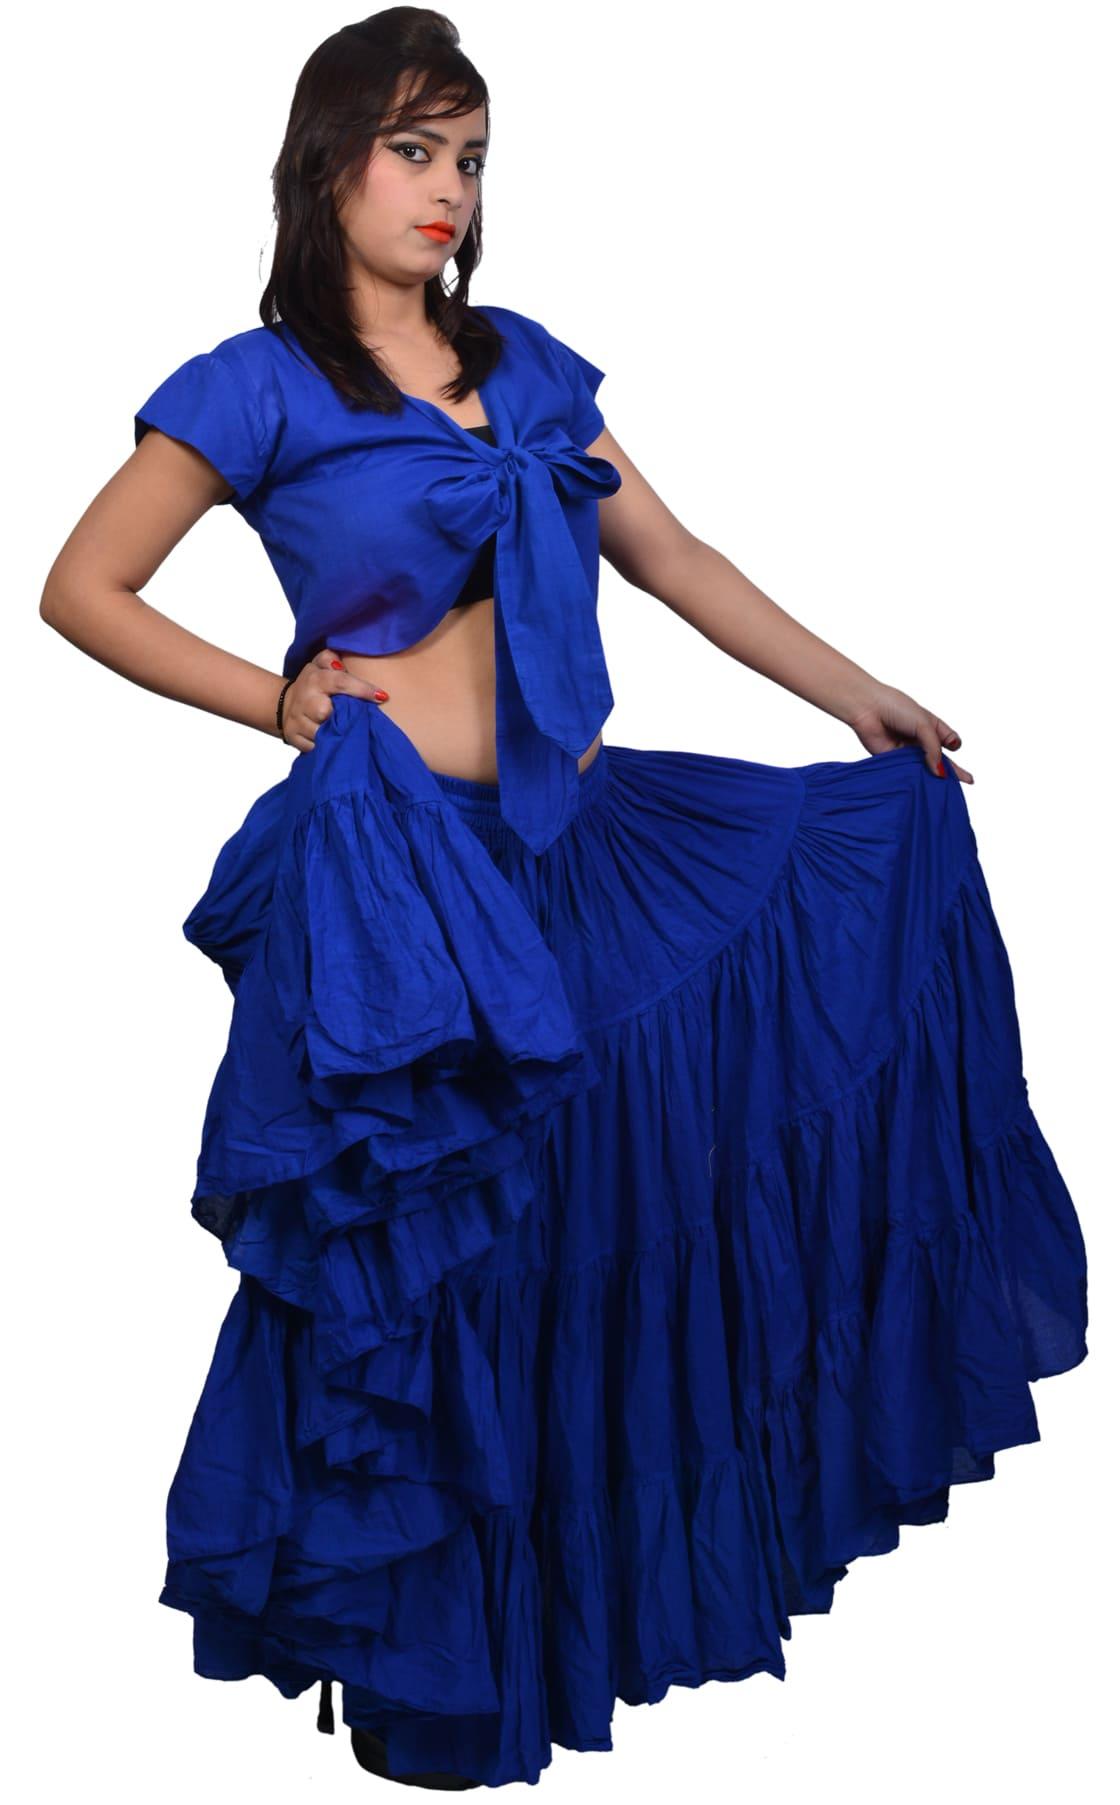 25 Yard Cotton skirt - Belly Dance Costume Skirts   eBay